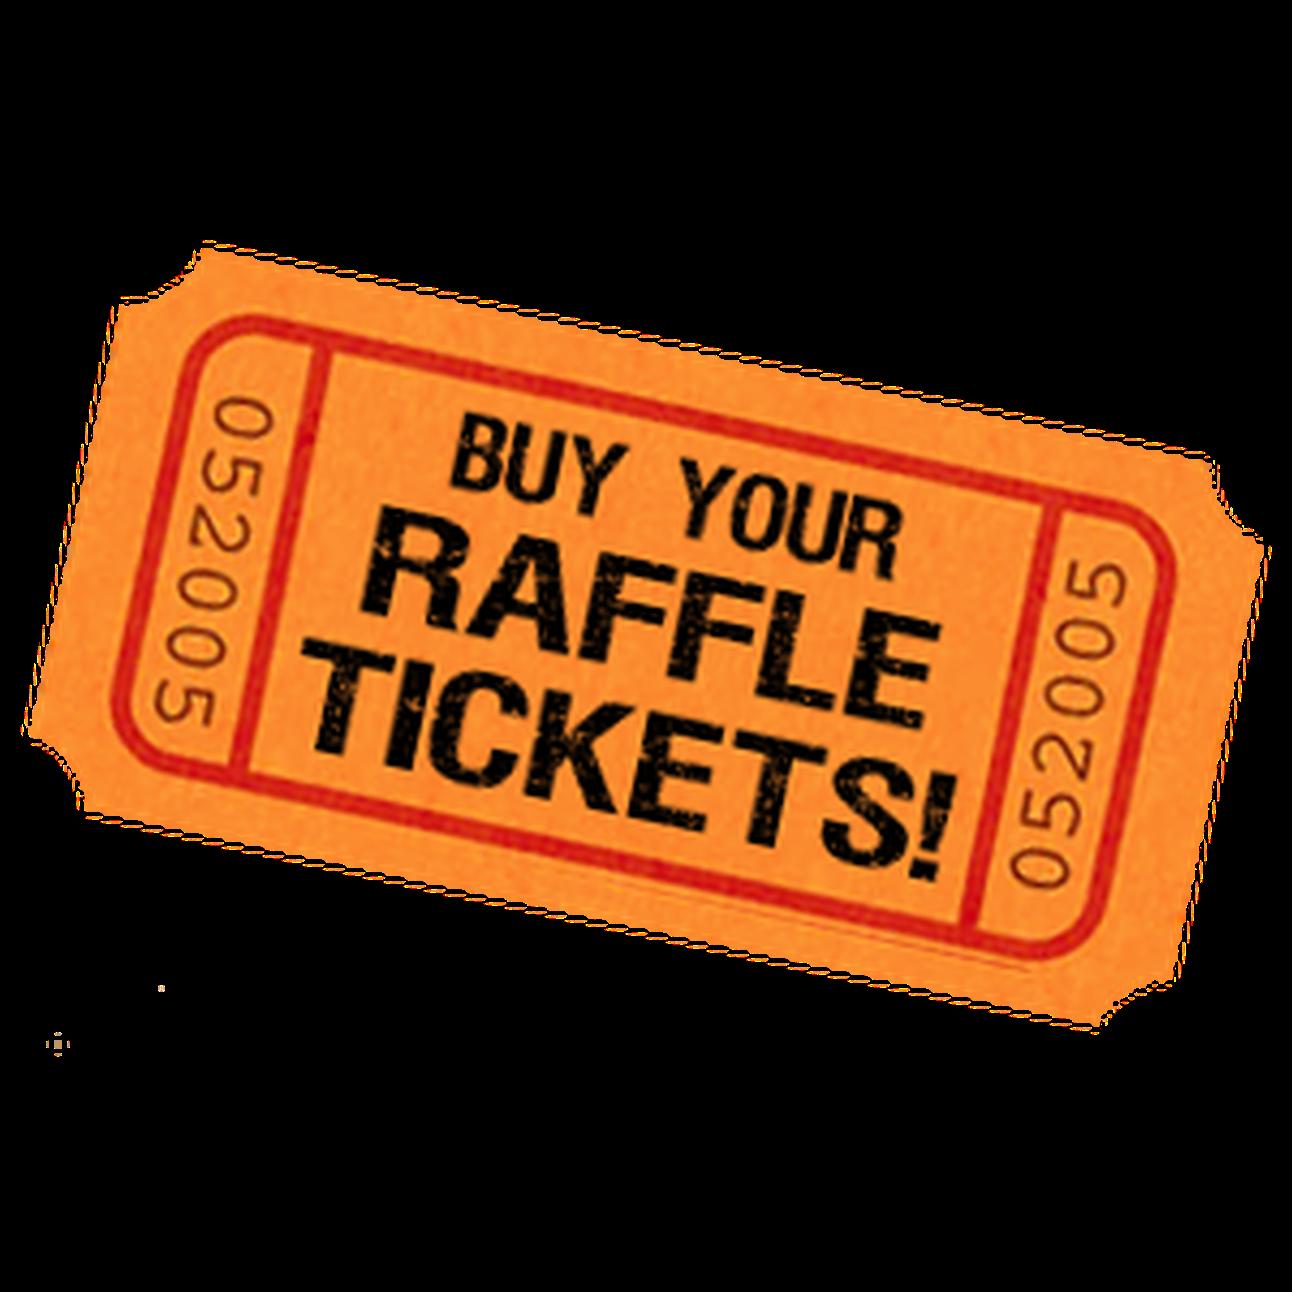 Raffle tickets in 2019 | tattoos | Raffle tickets, Ticket